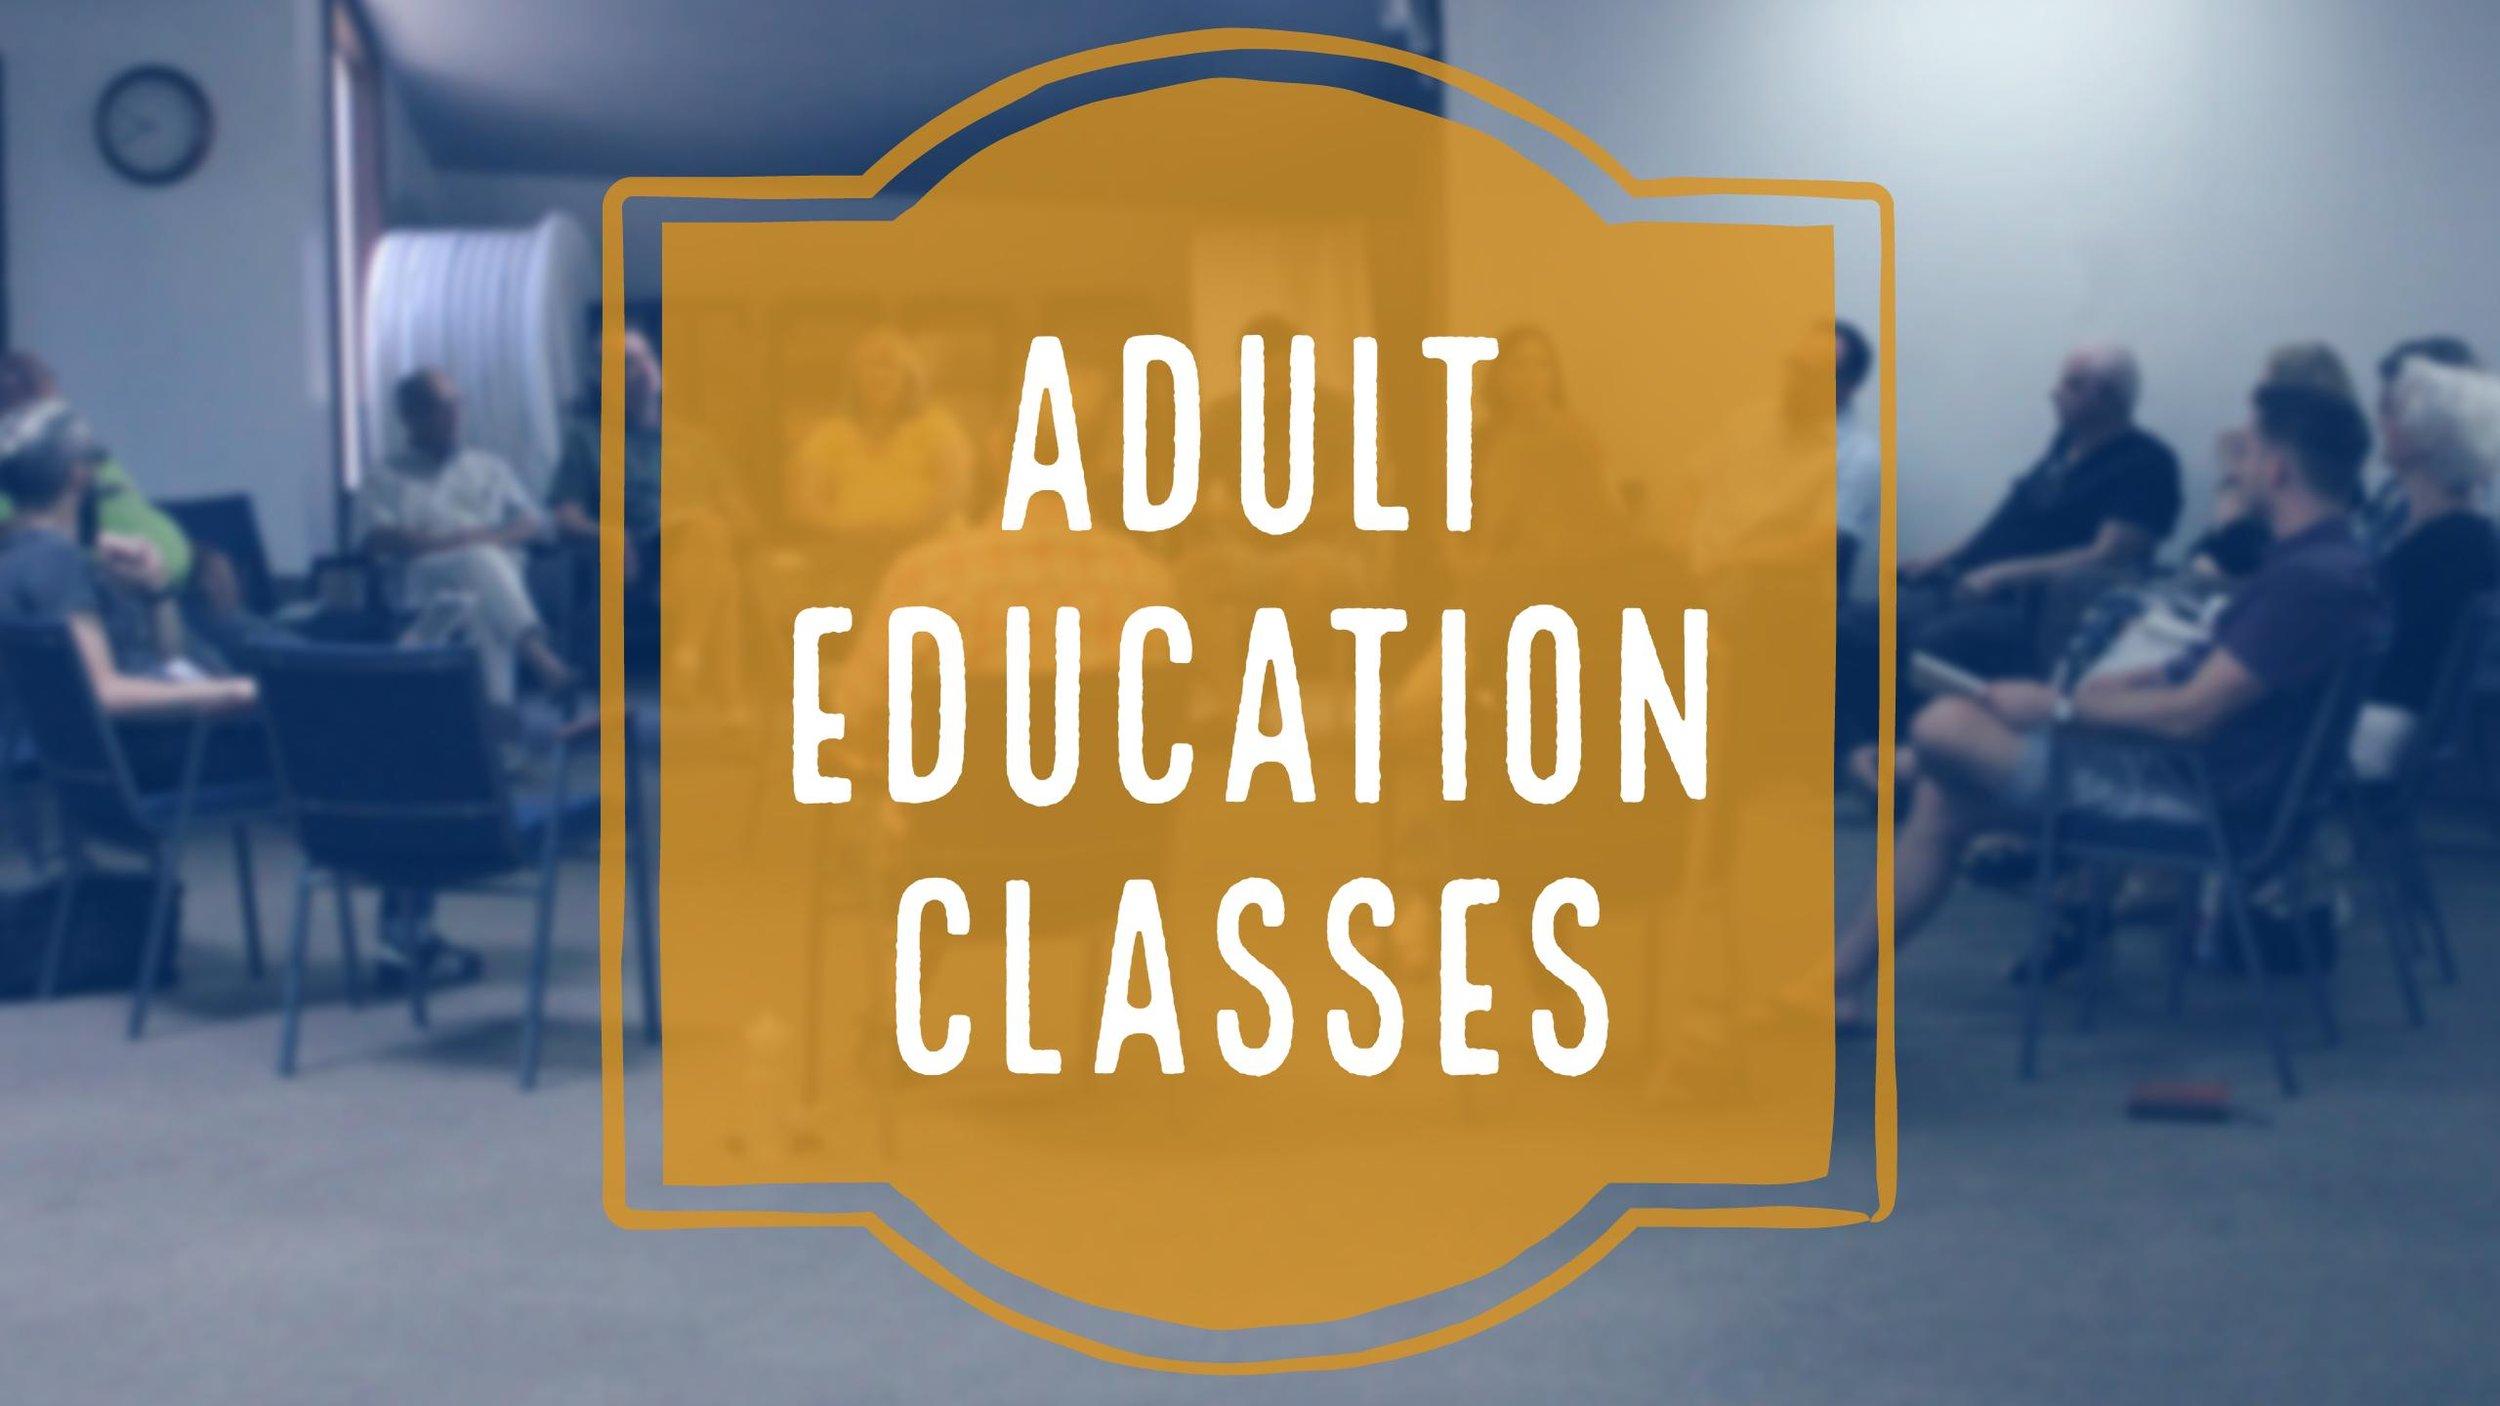 AdultEducationClasses.jpg